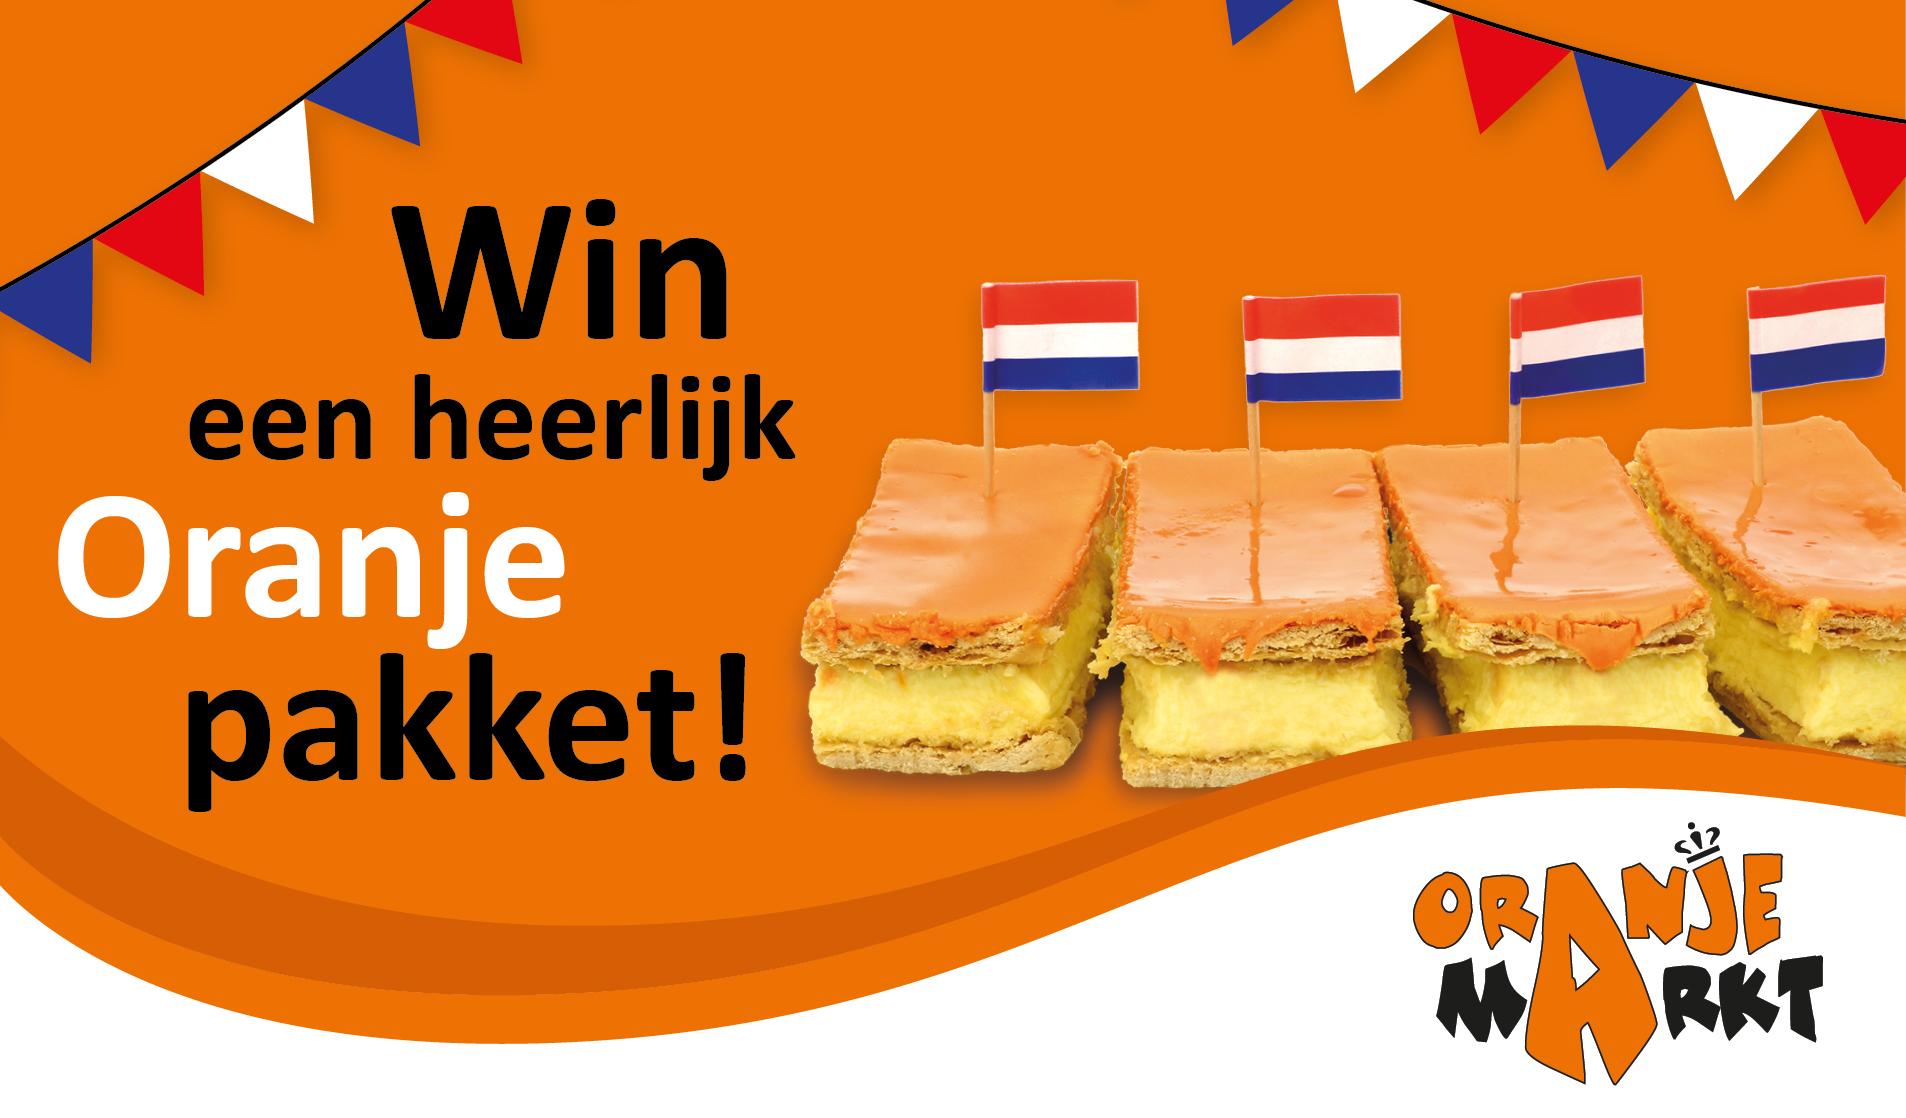 Oranjemarkt winactie oranje pakket